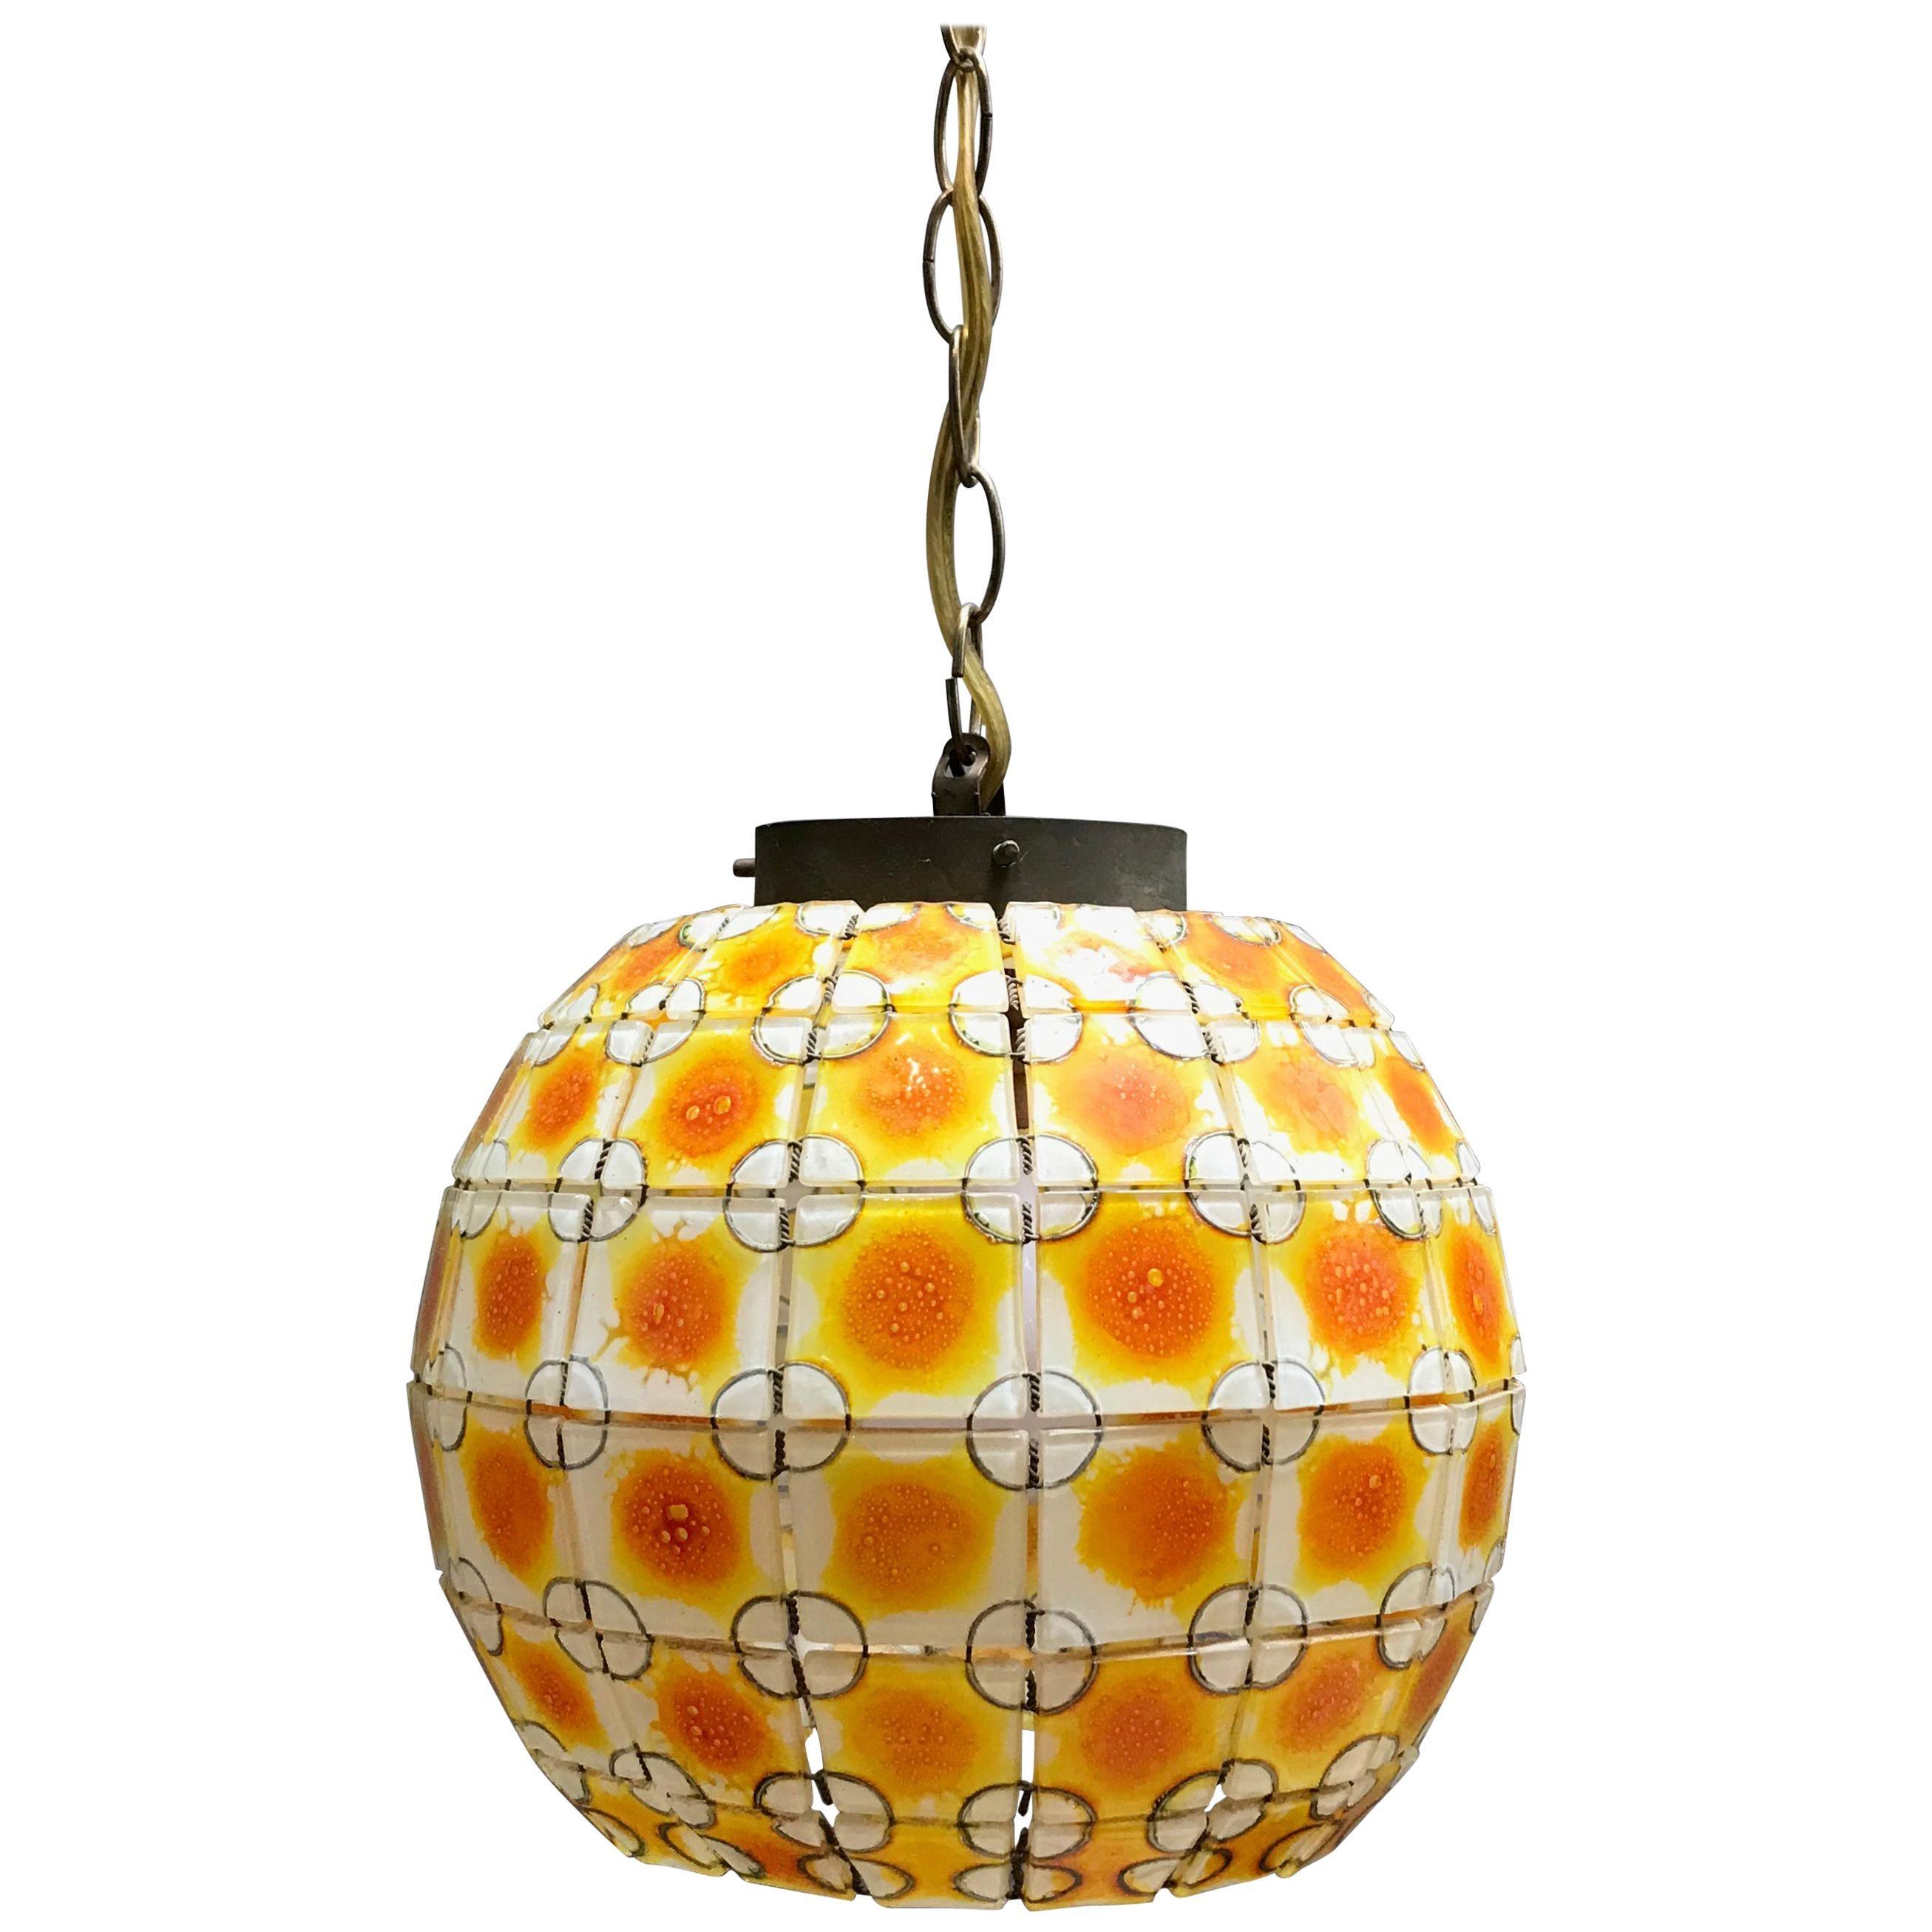 Midcentury Stain Glass Open Globe Pendant Light For Sale At 1stdibs